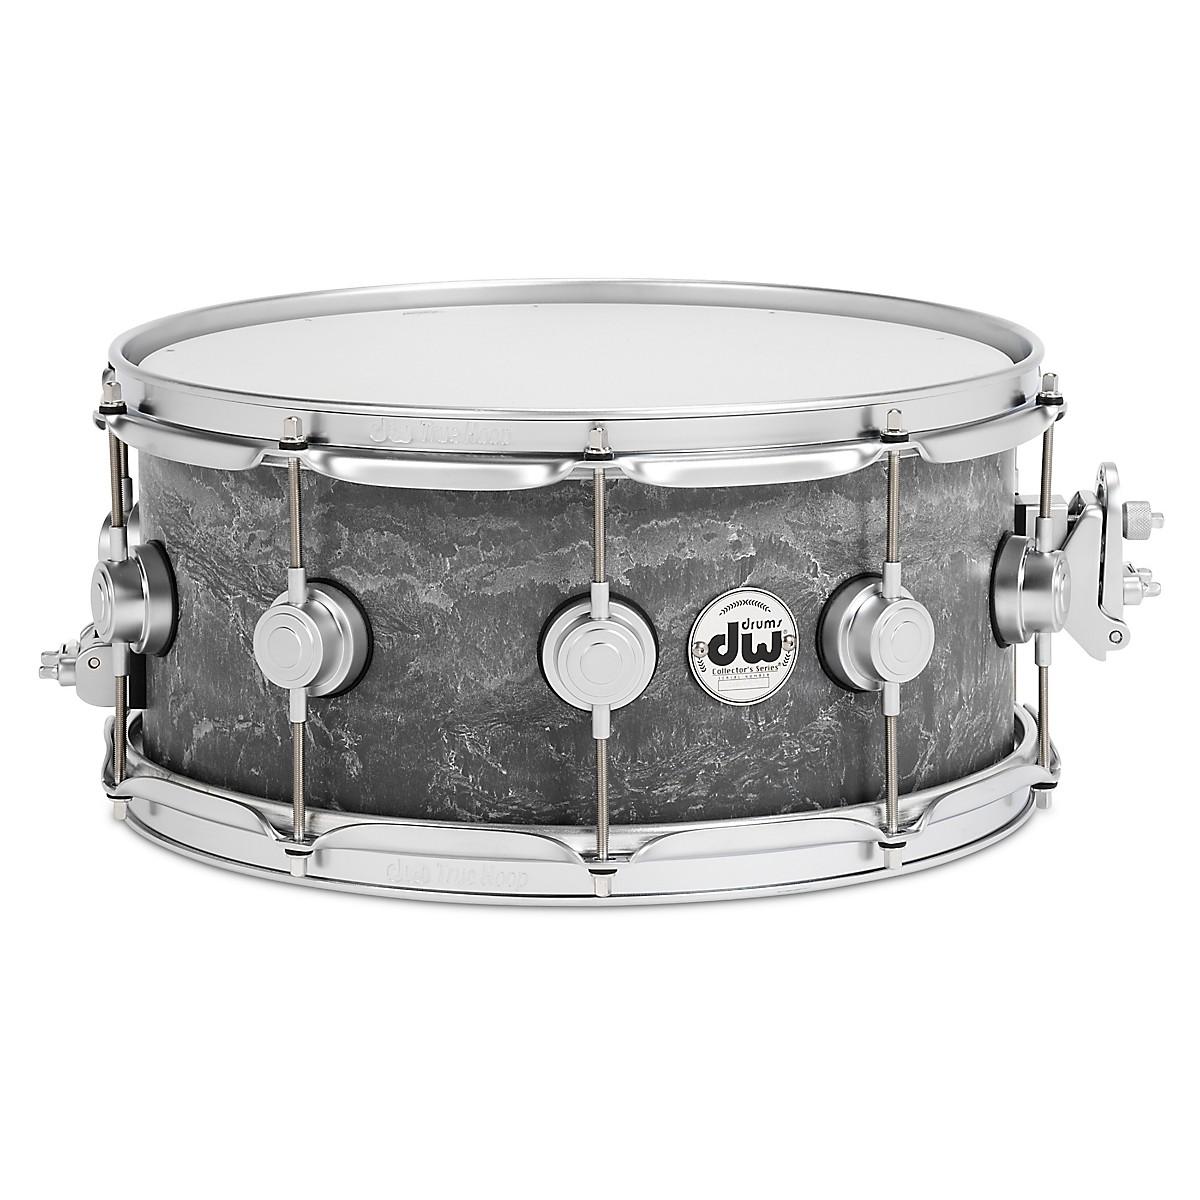 DW Concrete Snare Drum